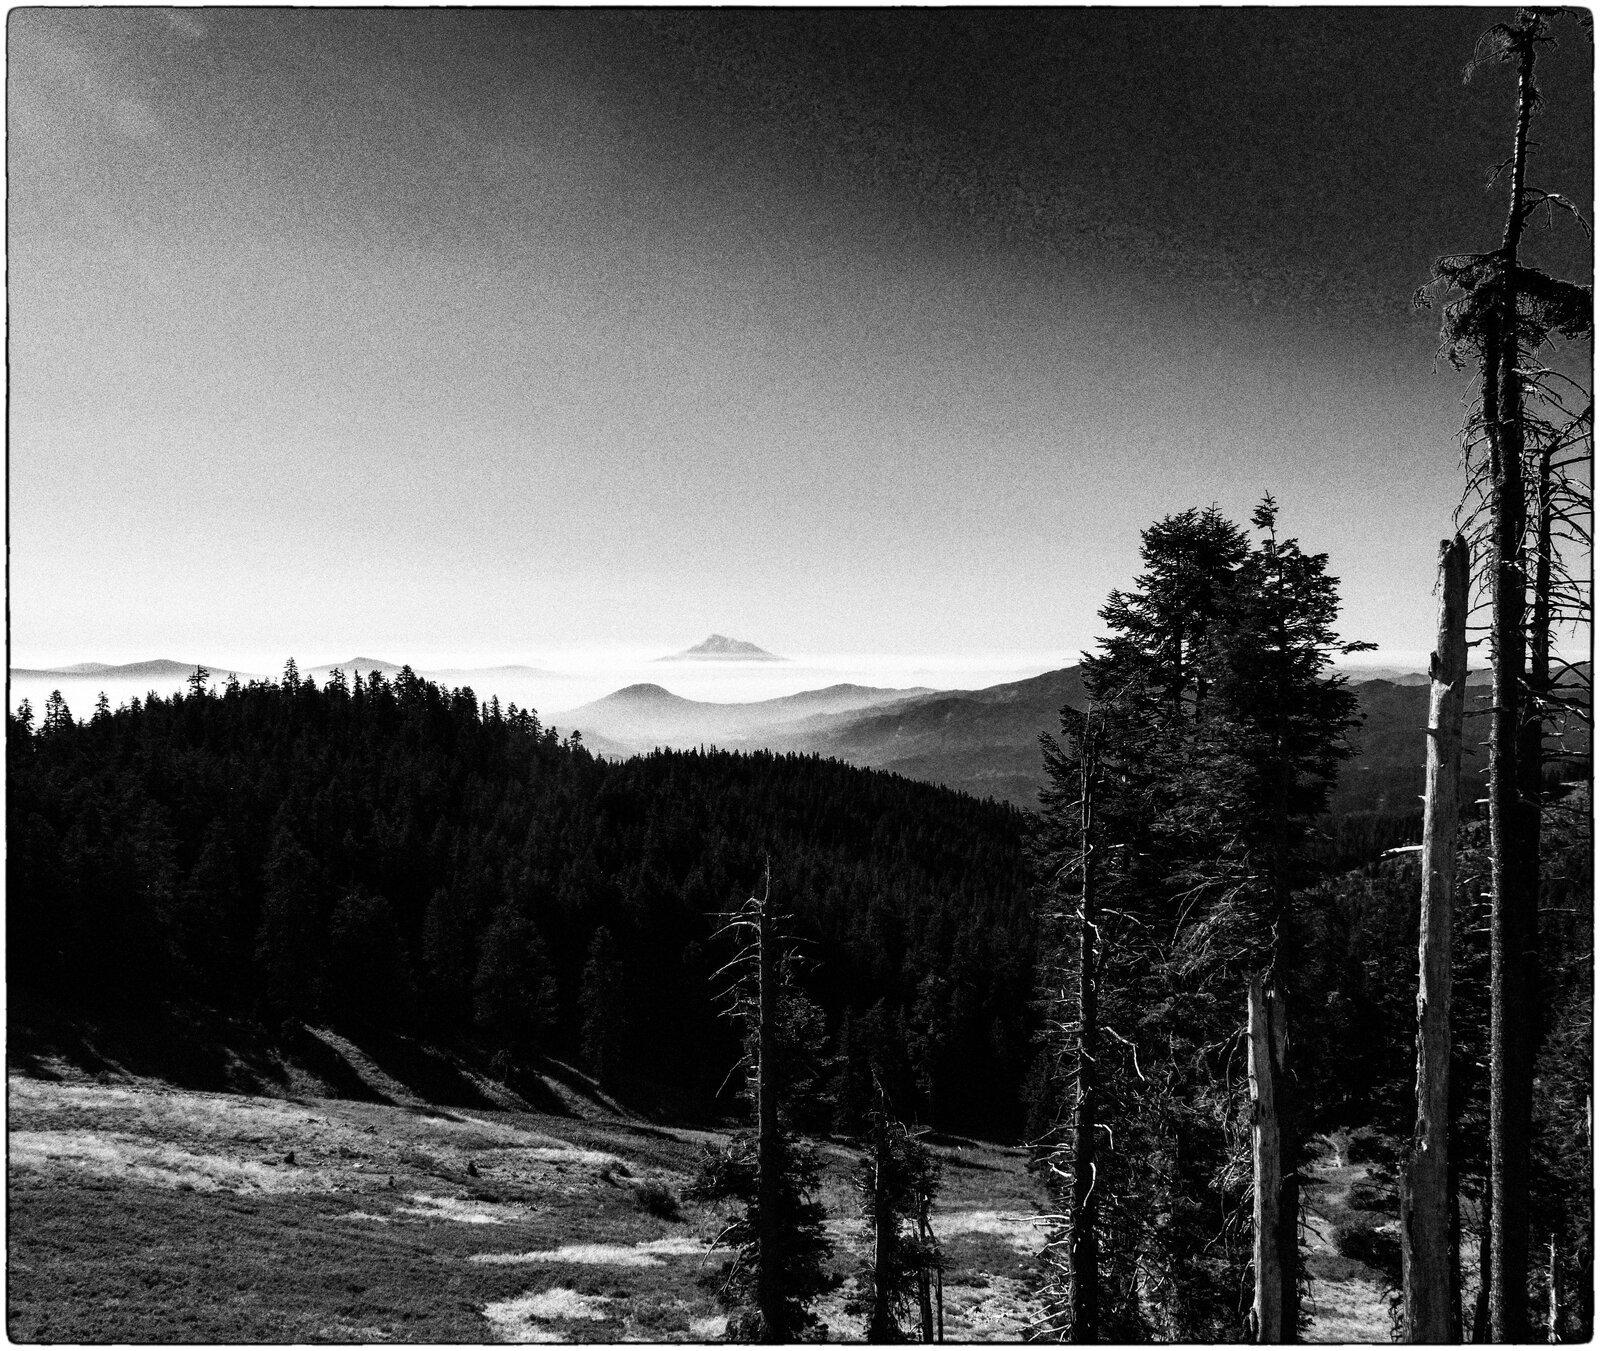 GX9_Aug31_21_Mt_Shasta-wildfire_smoke.jpg